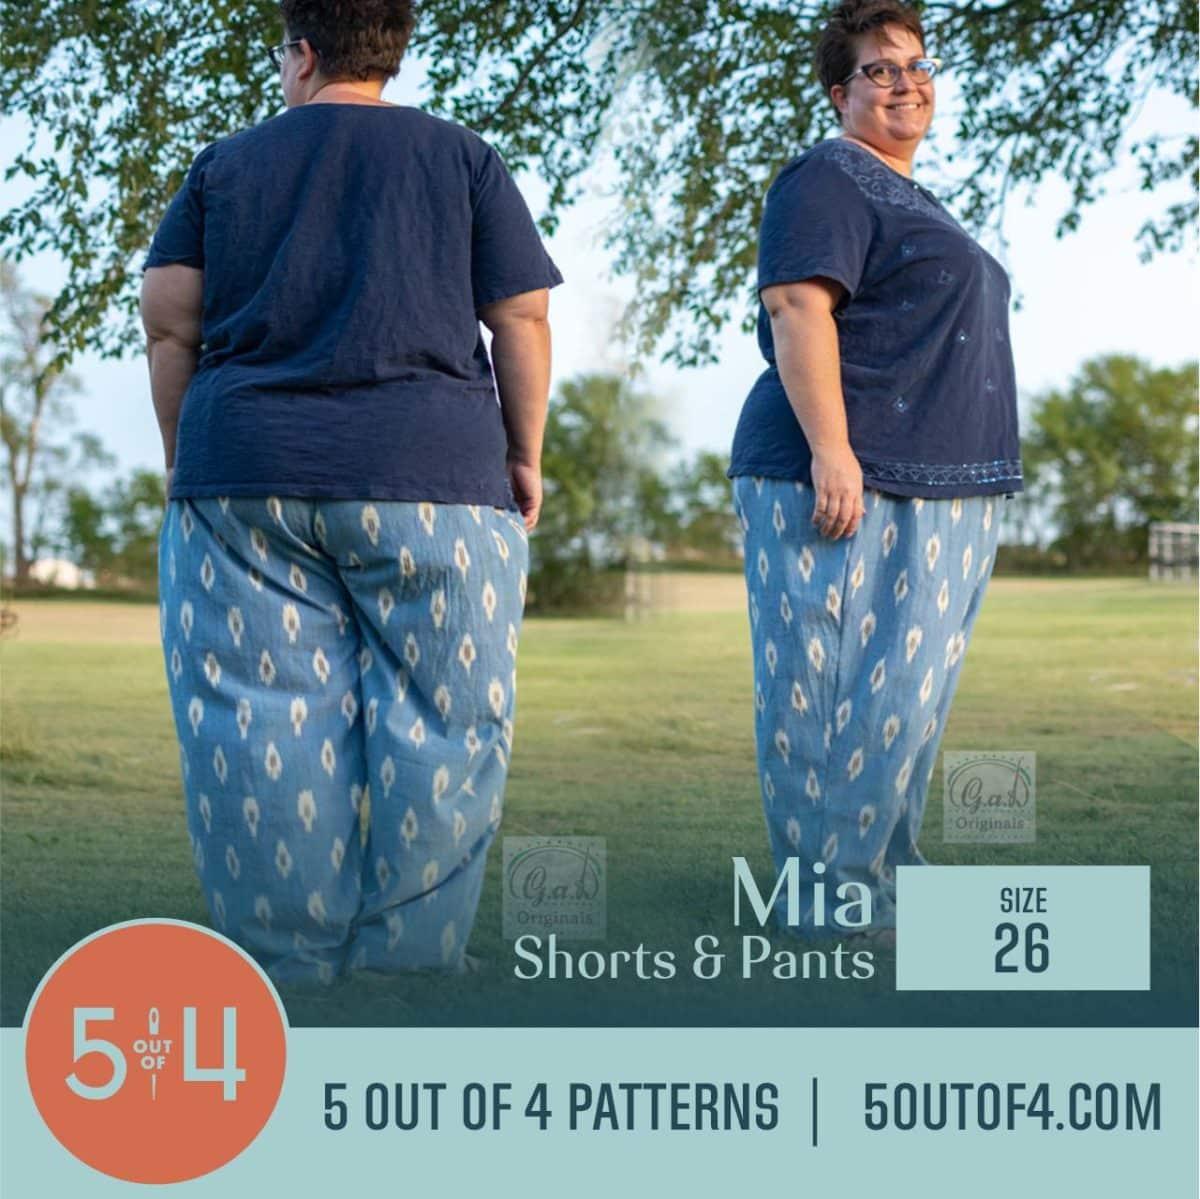 5oo4 Patterns Mia Pants size 26